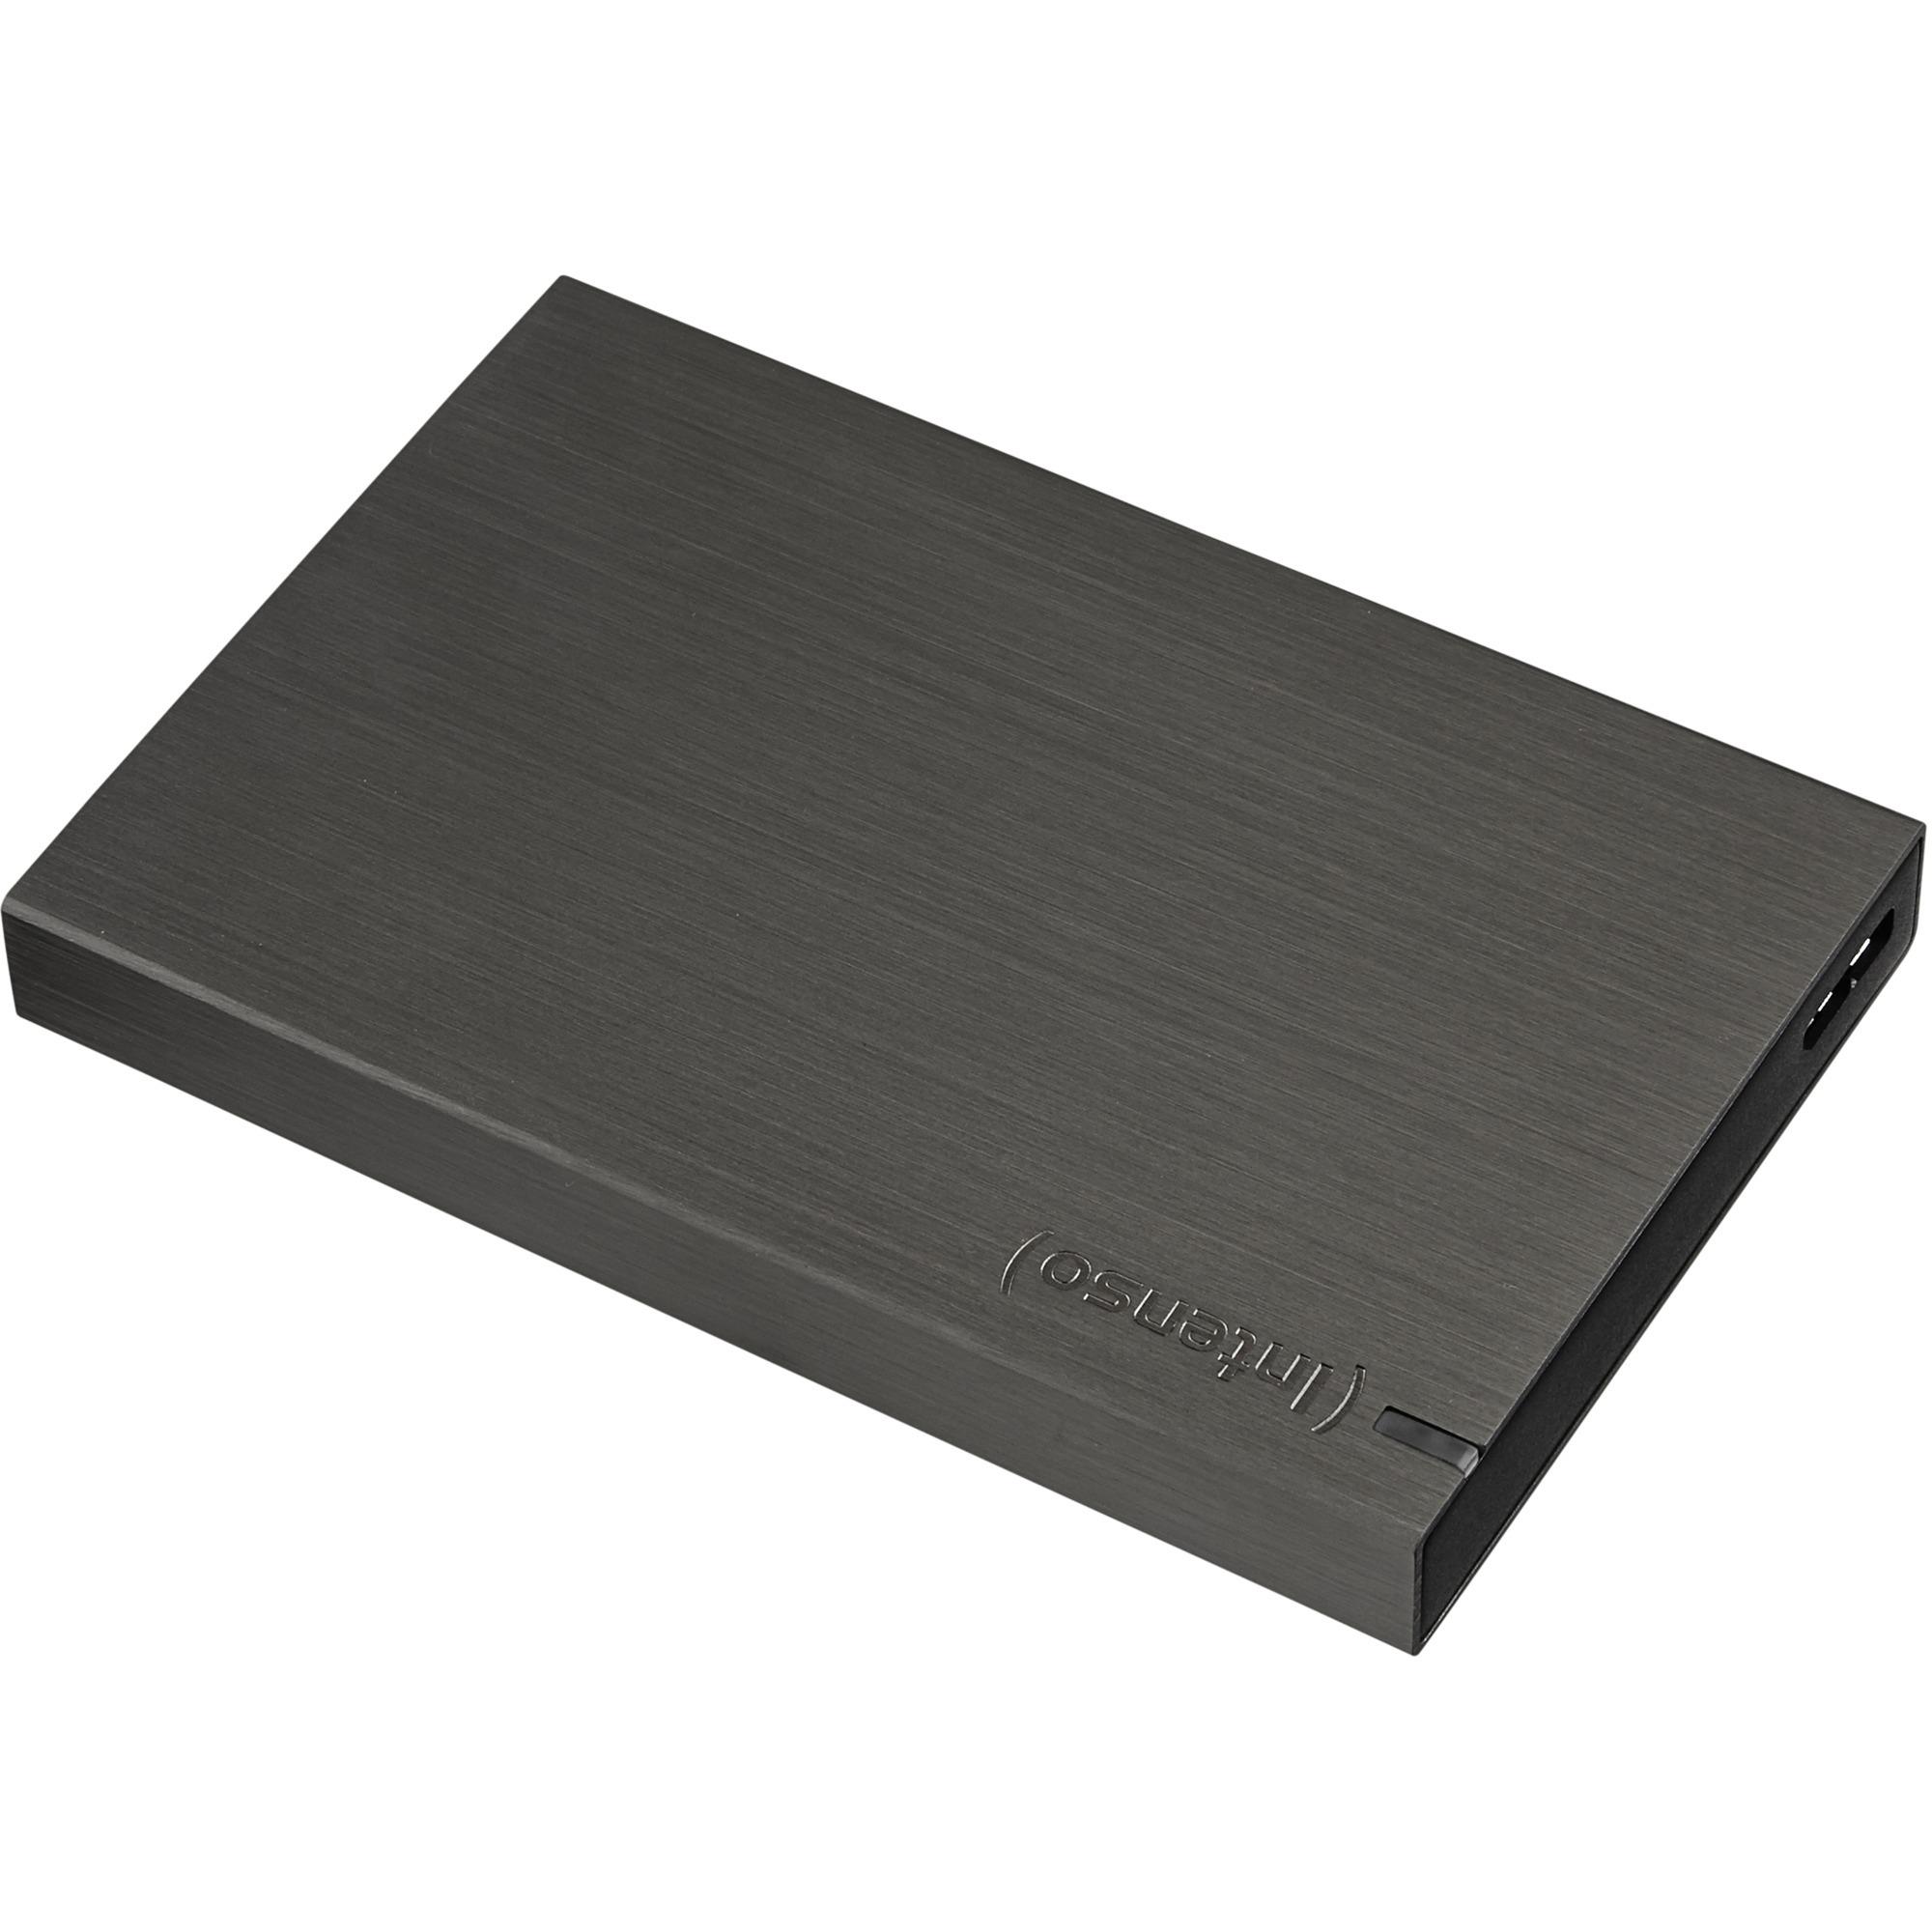 memory-board-1-tb-harddisk